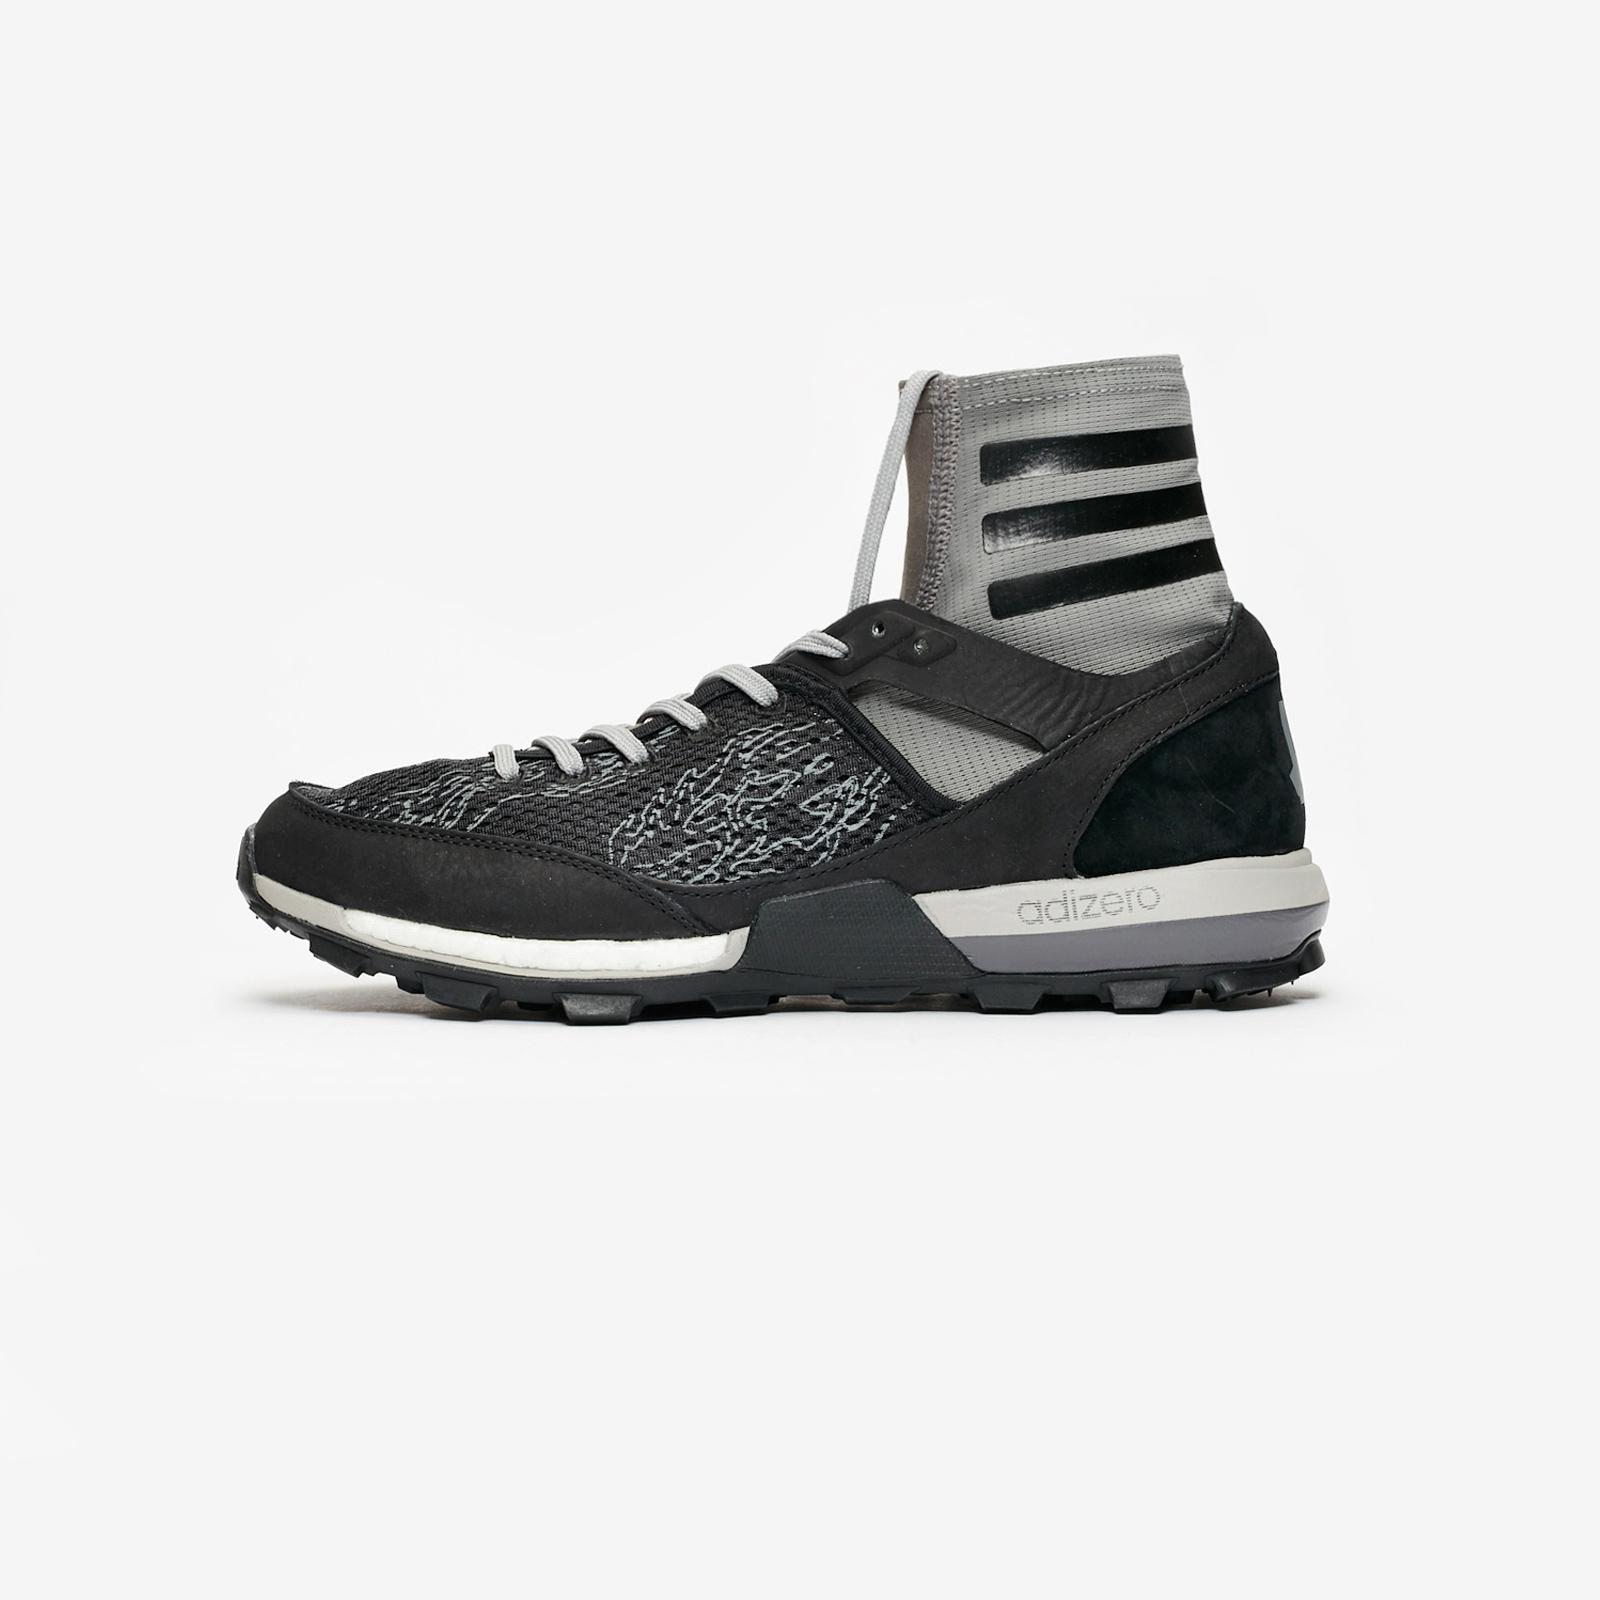 buy popular 087b0 51116 ... adidas Consortium Adizero XT Boost x UNDFTD ...